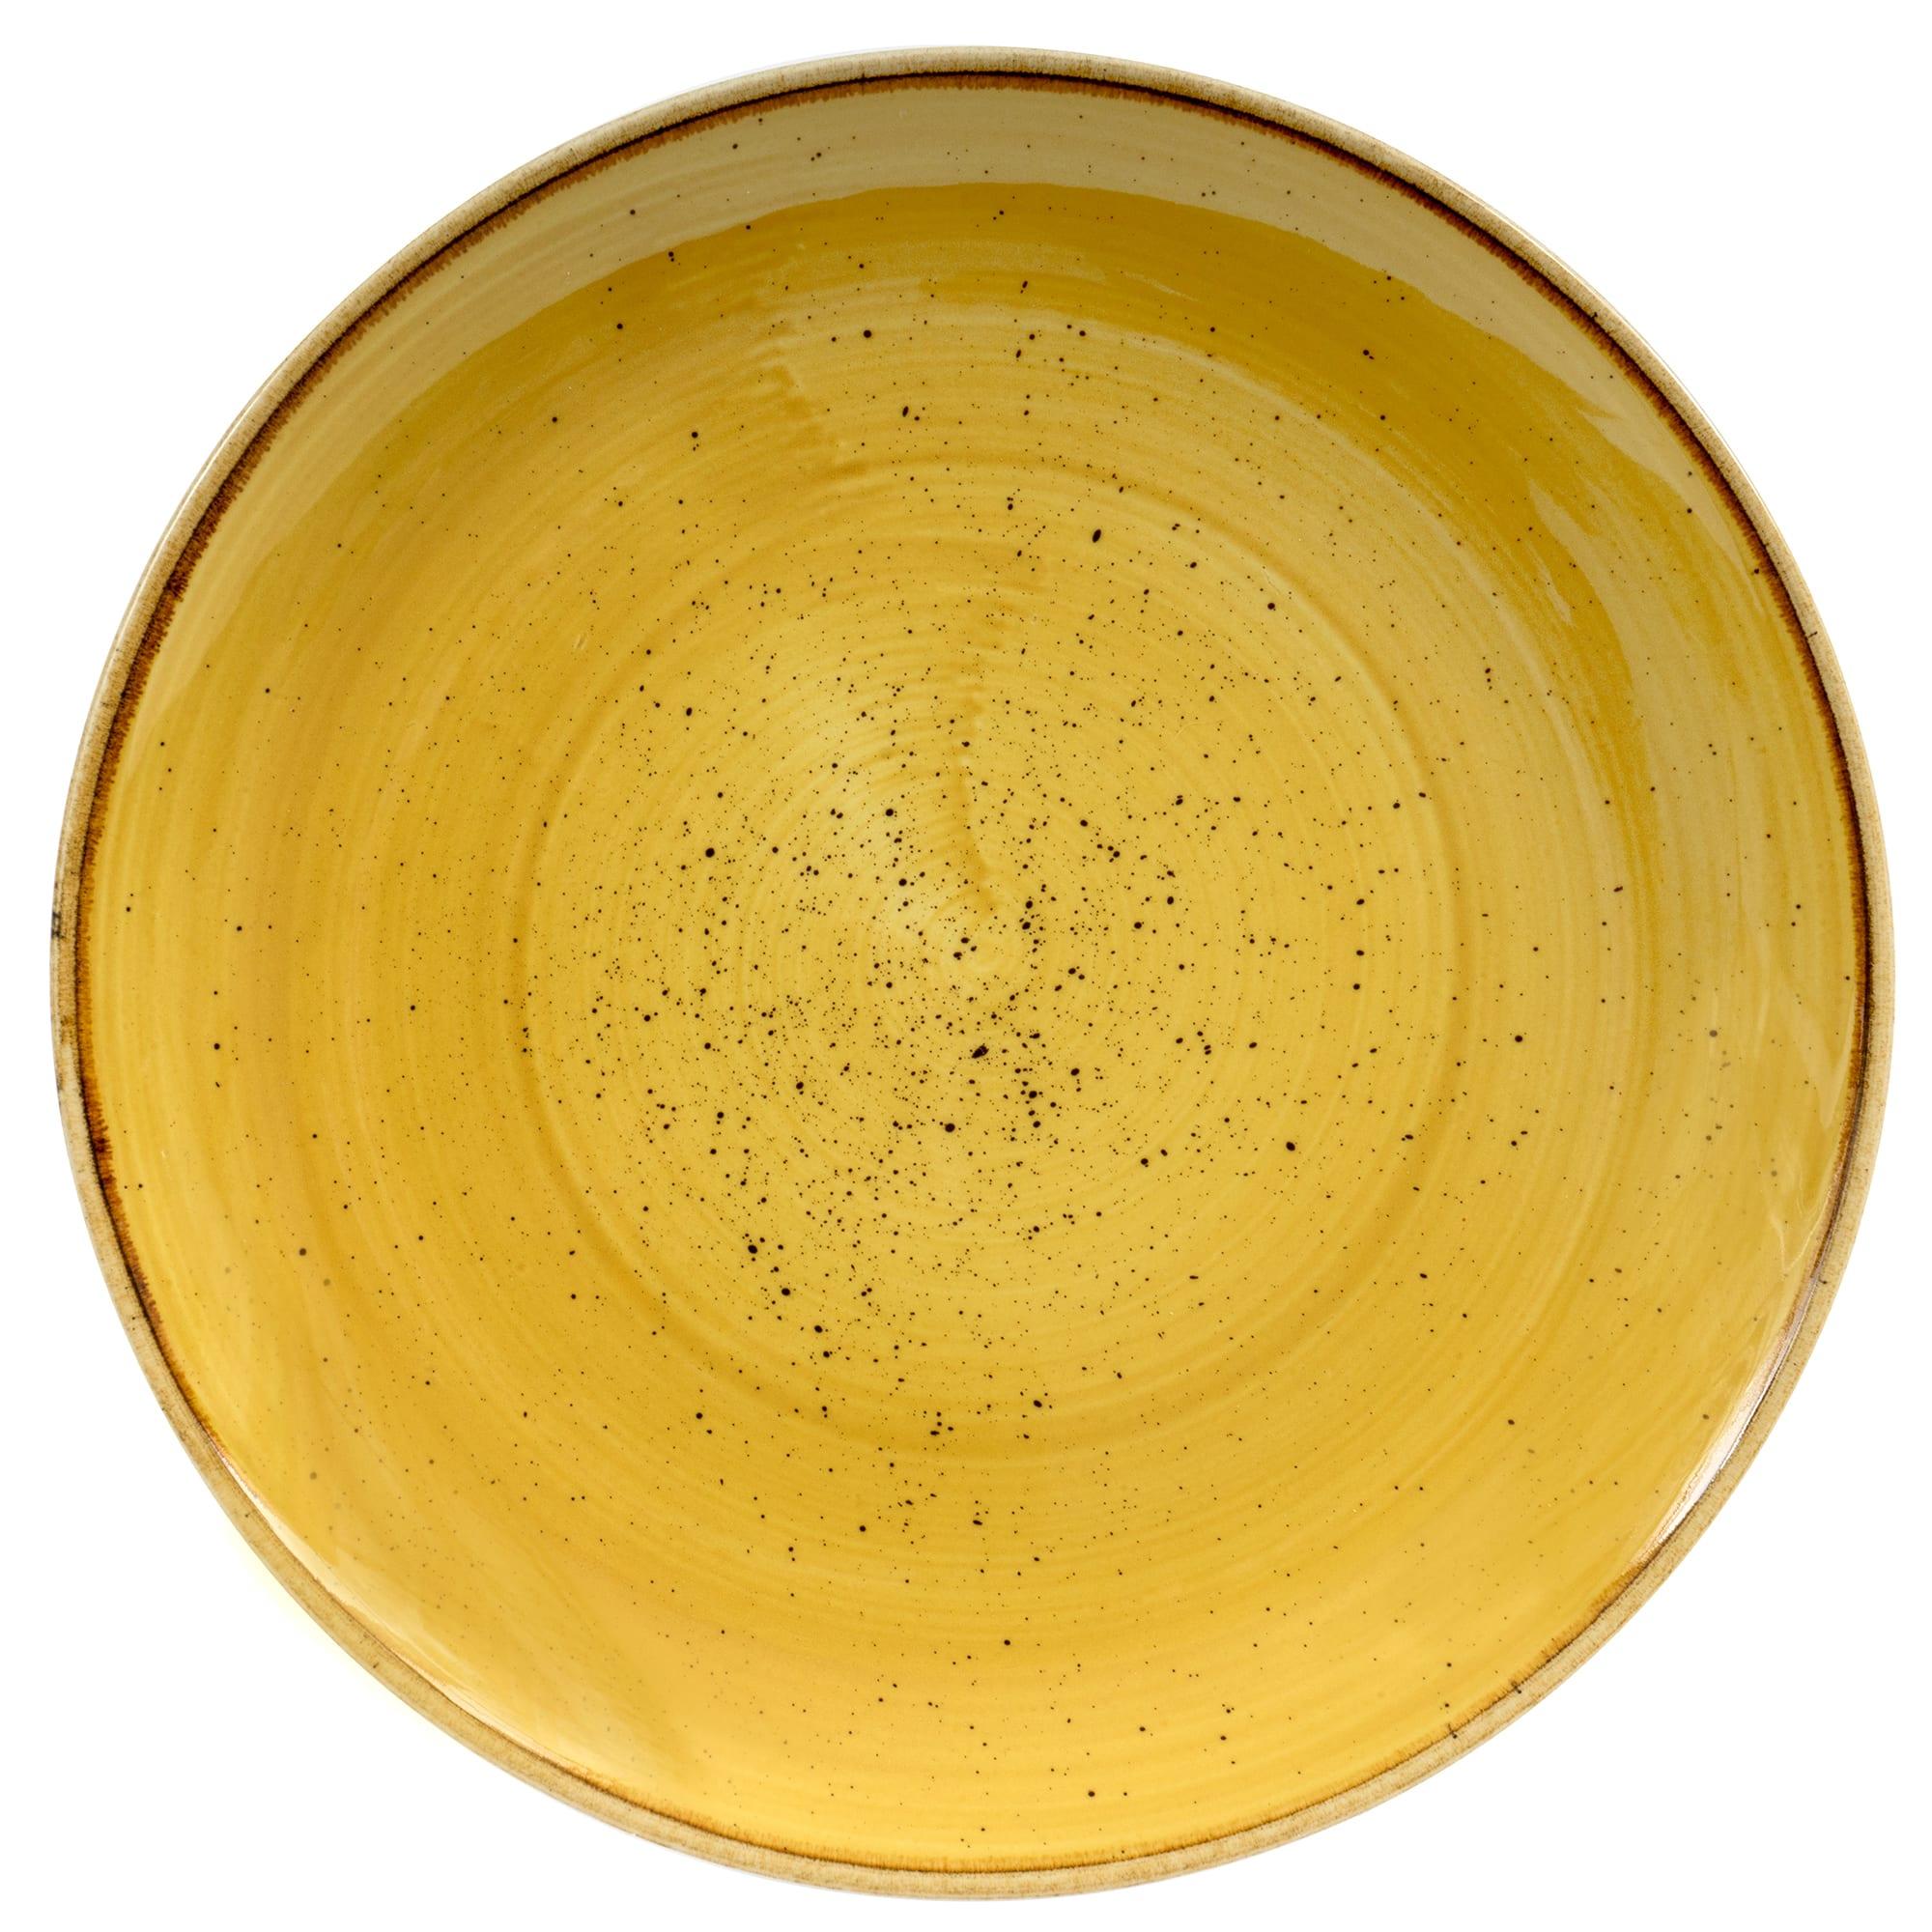 "Churchill SMSSEVP81 8.67"" Round Stonecast Plate - Ceramic, Mustard Seed Yellow"